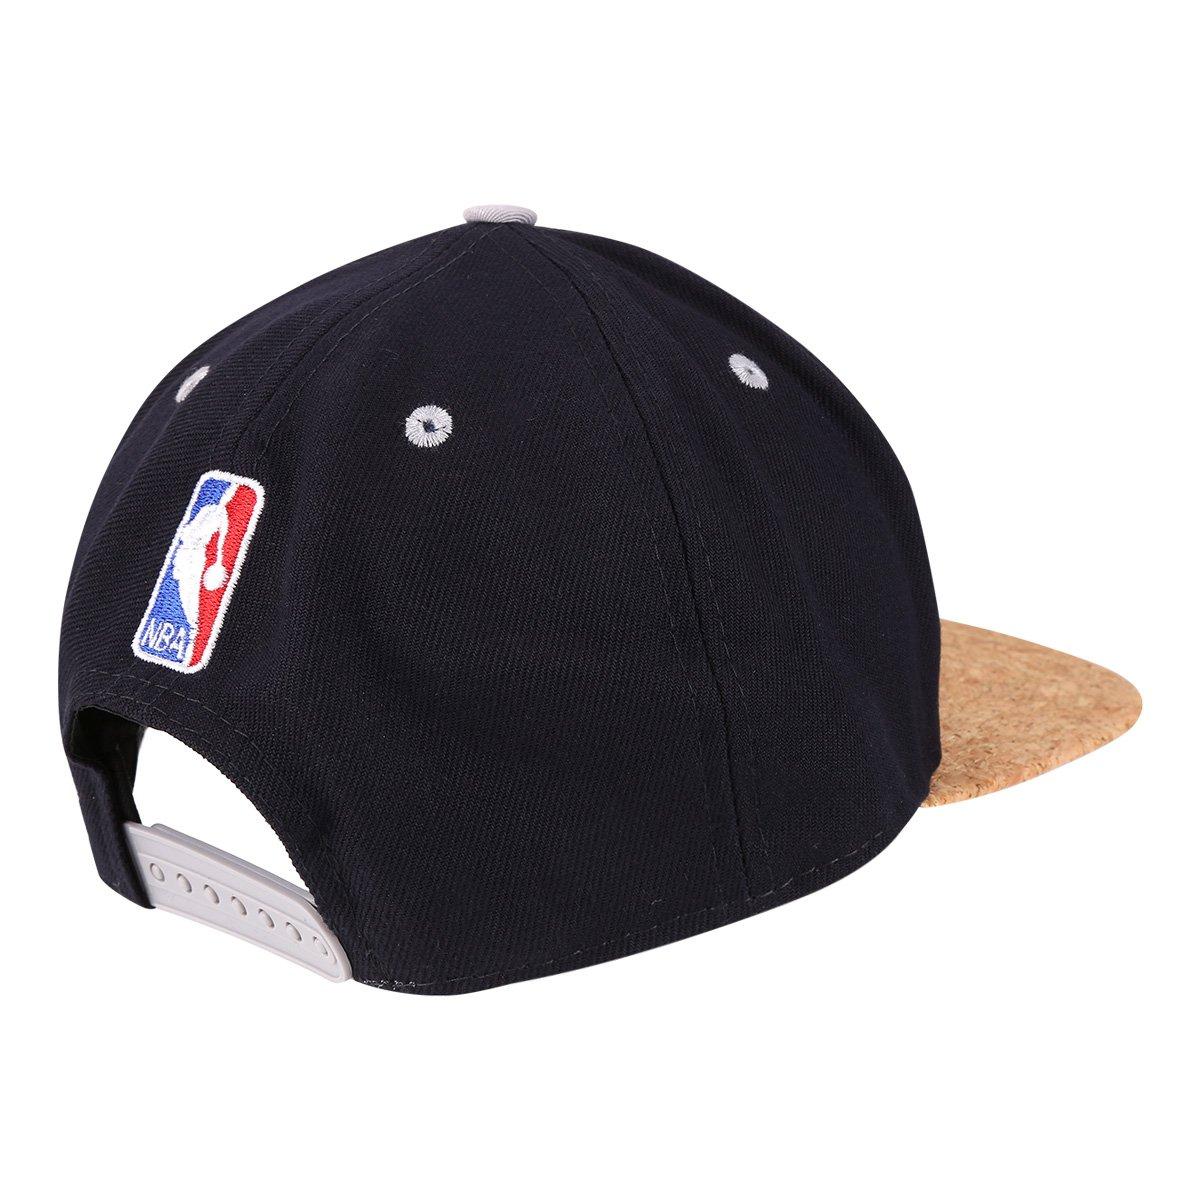 Boné New Era NBA San Antonio Spurs Aba Reta Cork - Marinho - Compre ... 2faaece845a